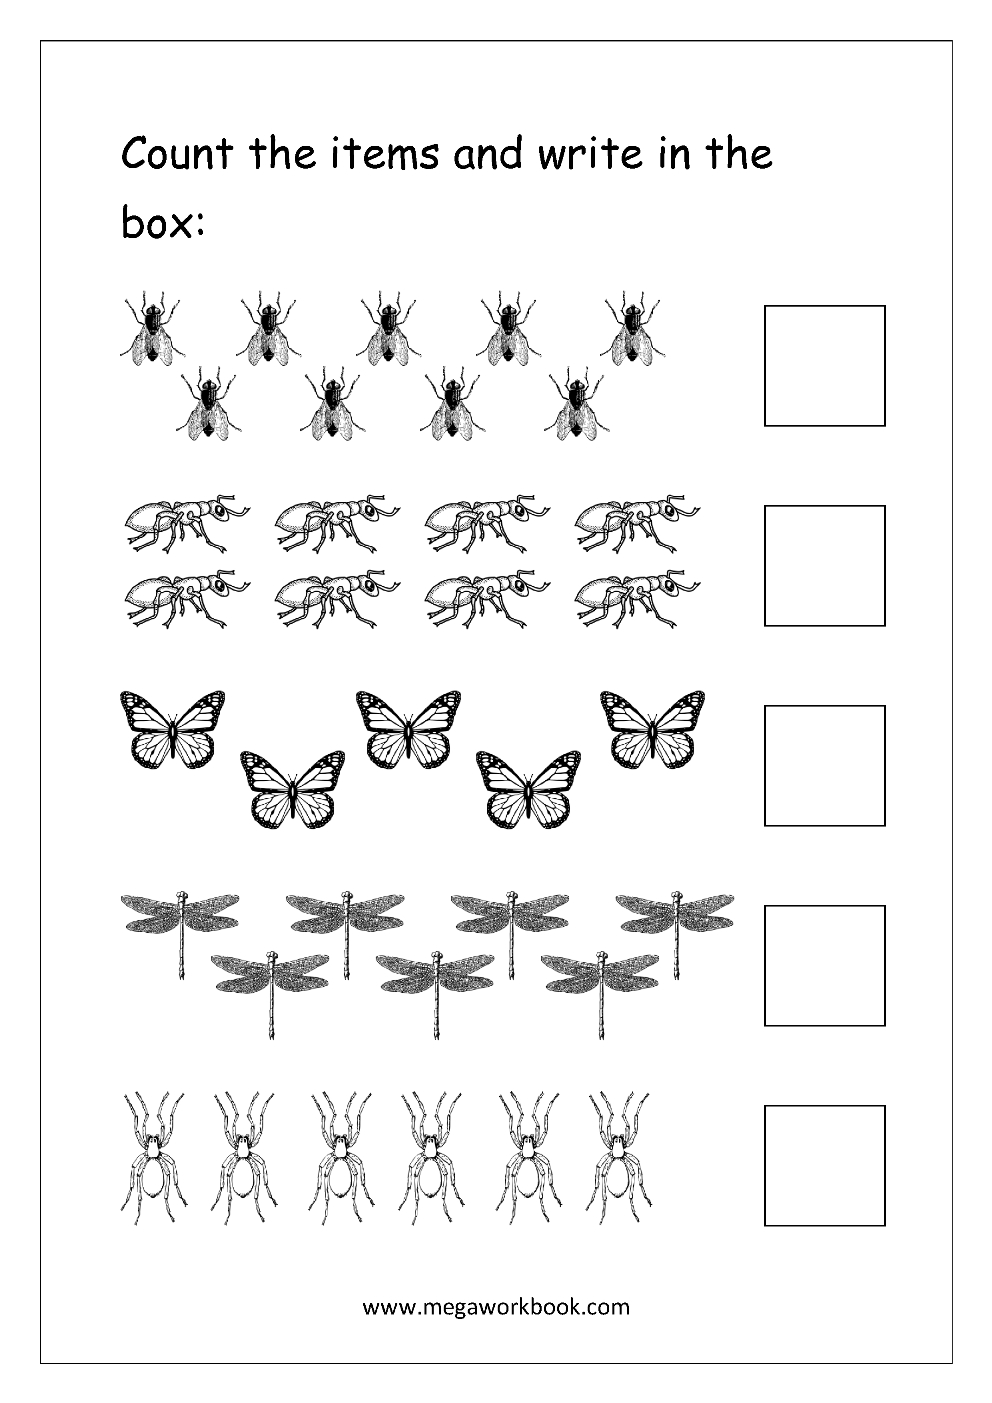 Free Printable Number Counting Worksheets - Count And Match - Count - Free Printable Counting Worksheets 1 20